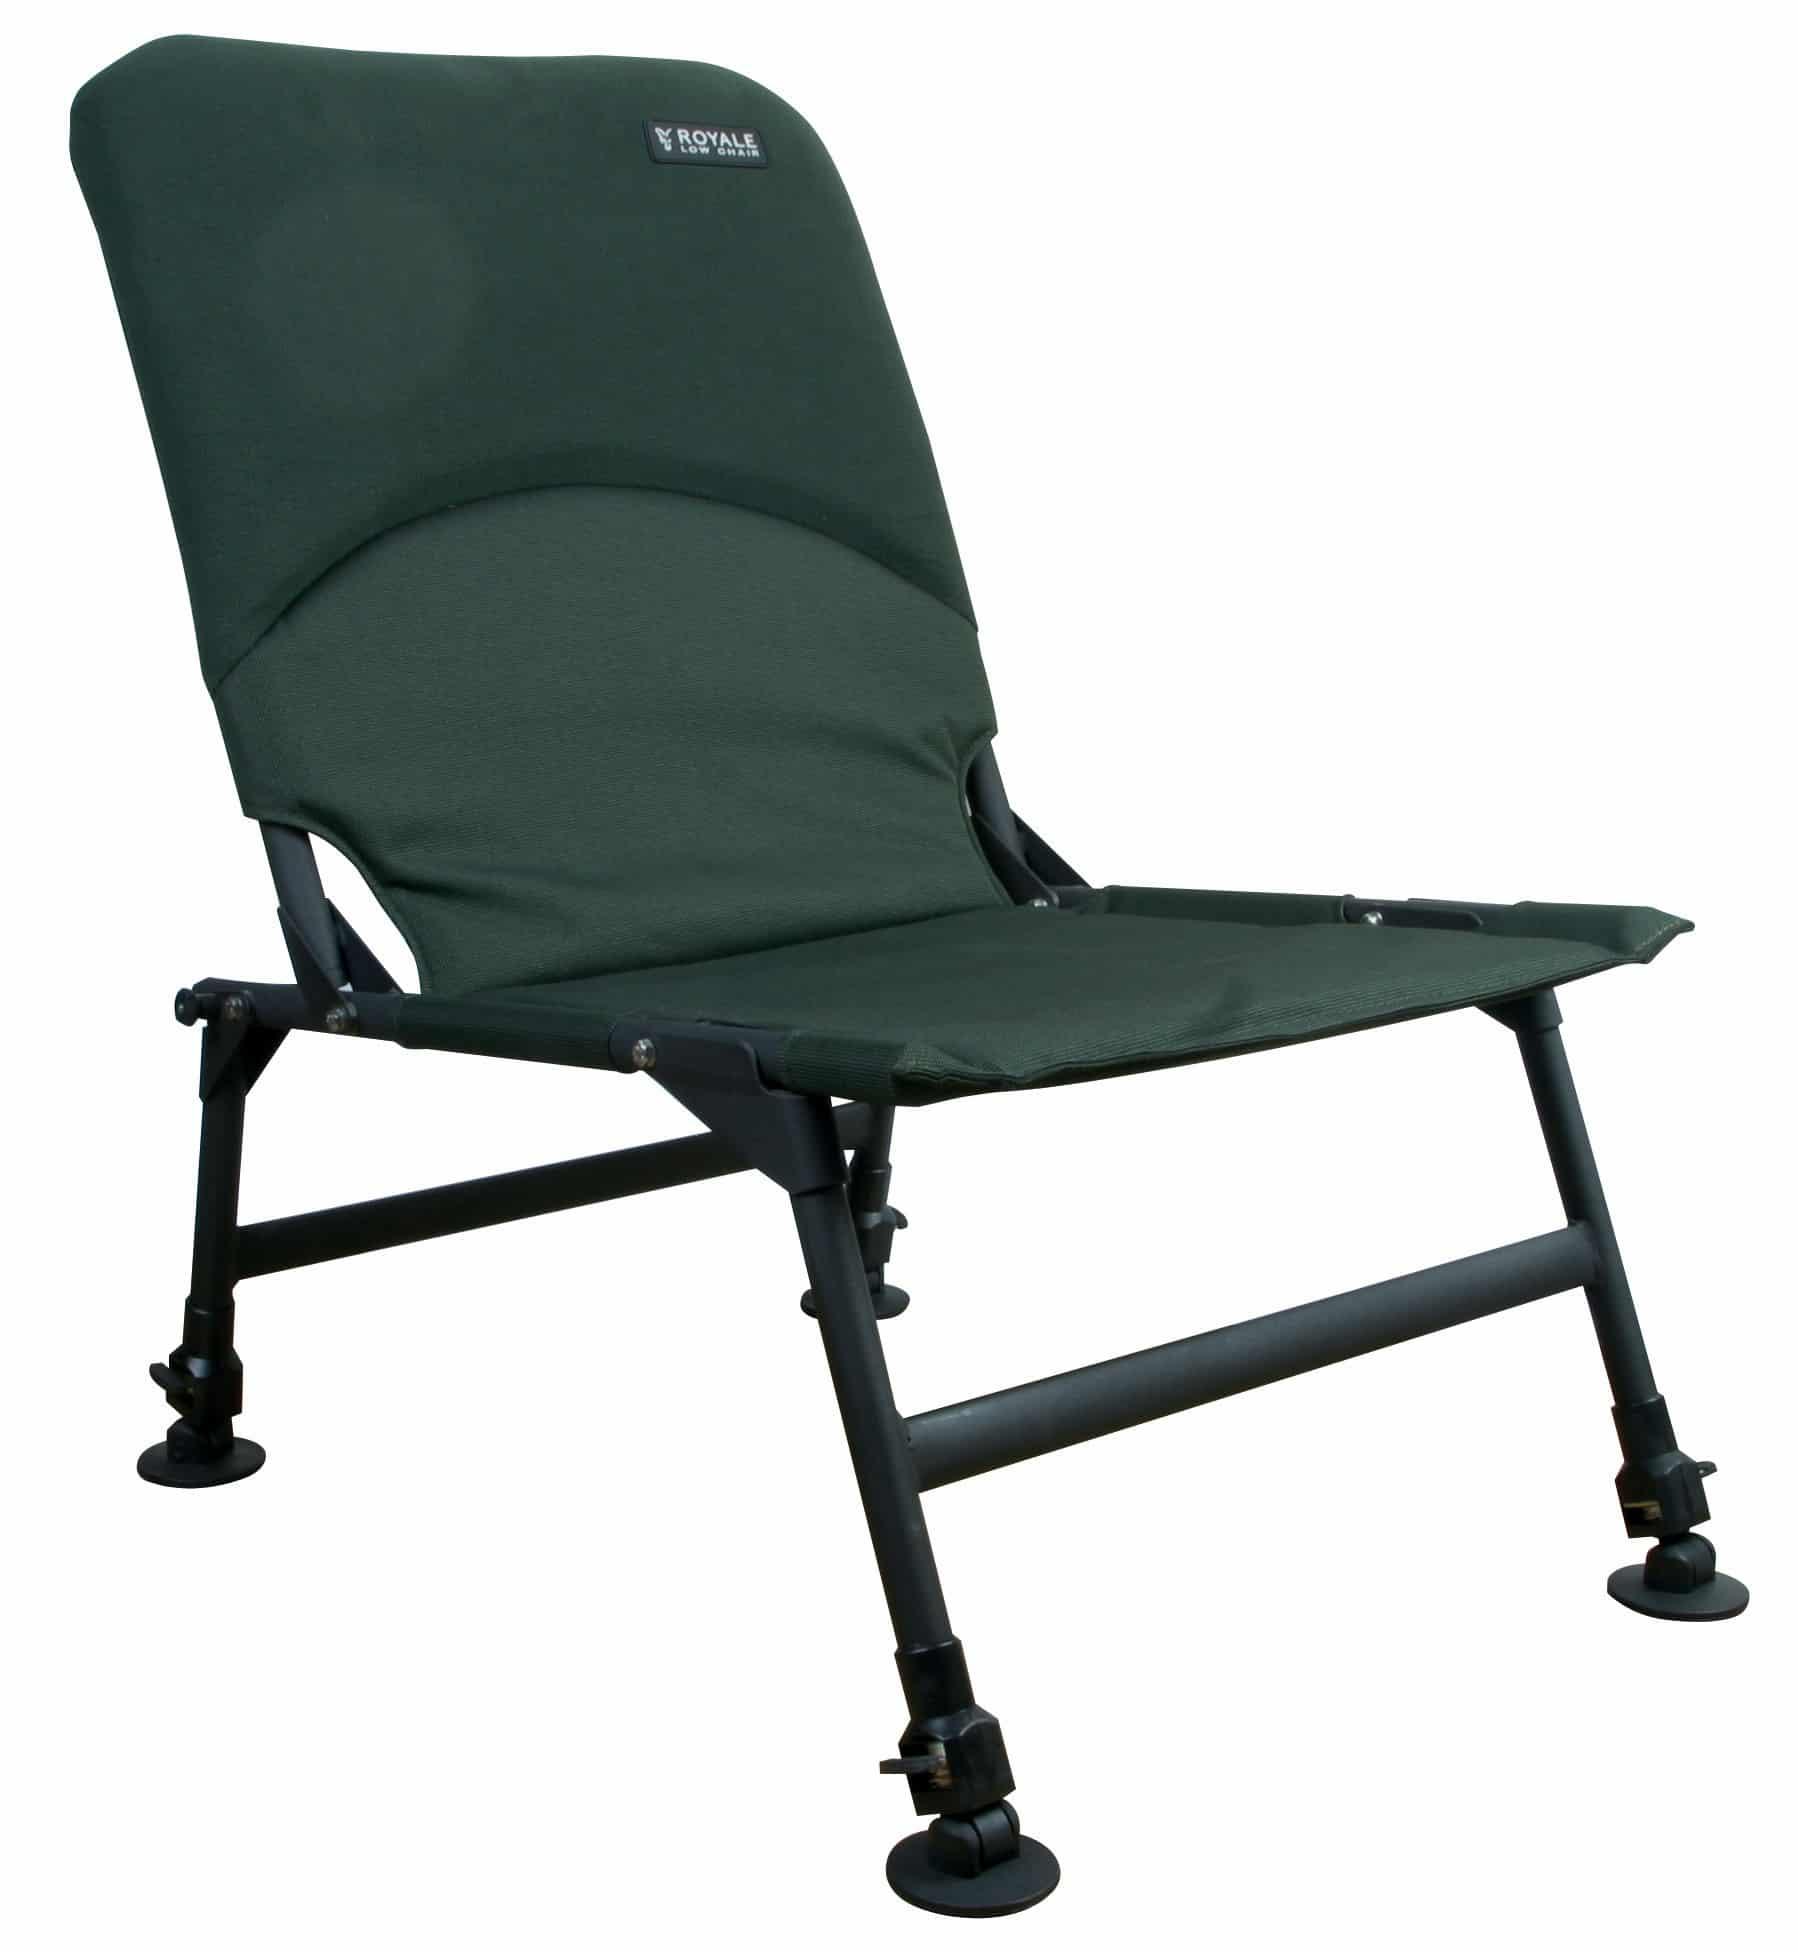 FOX Royale Low Chair